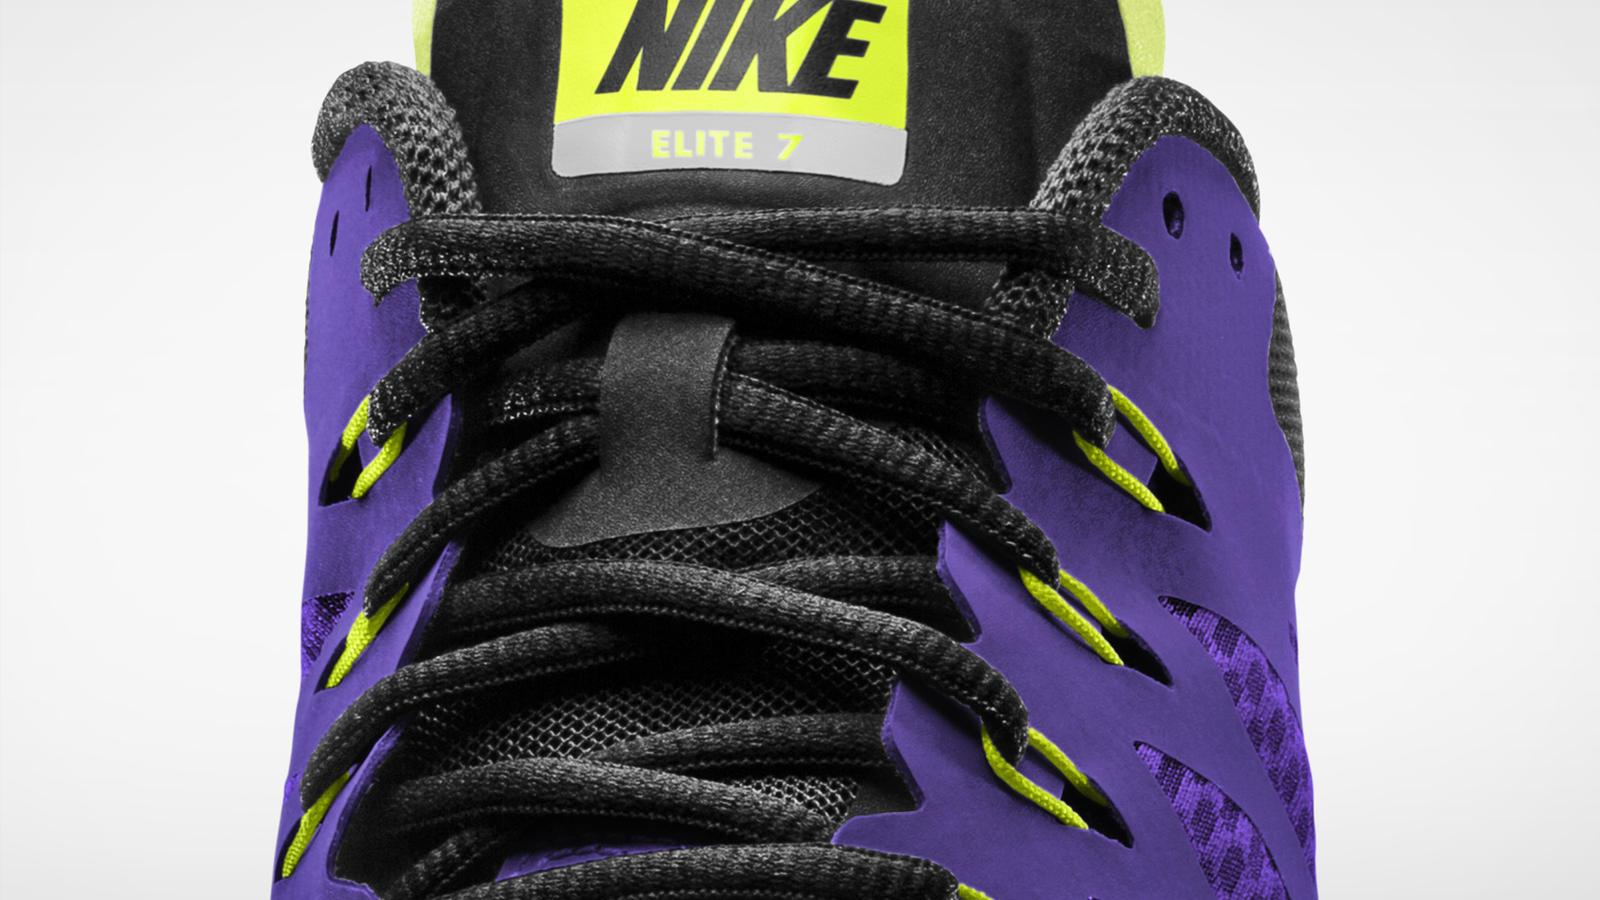 half off 03cd6 e0861 Sleek New Nike Air Zoom Elite 7 the Lightest Yet - Nike News